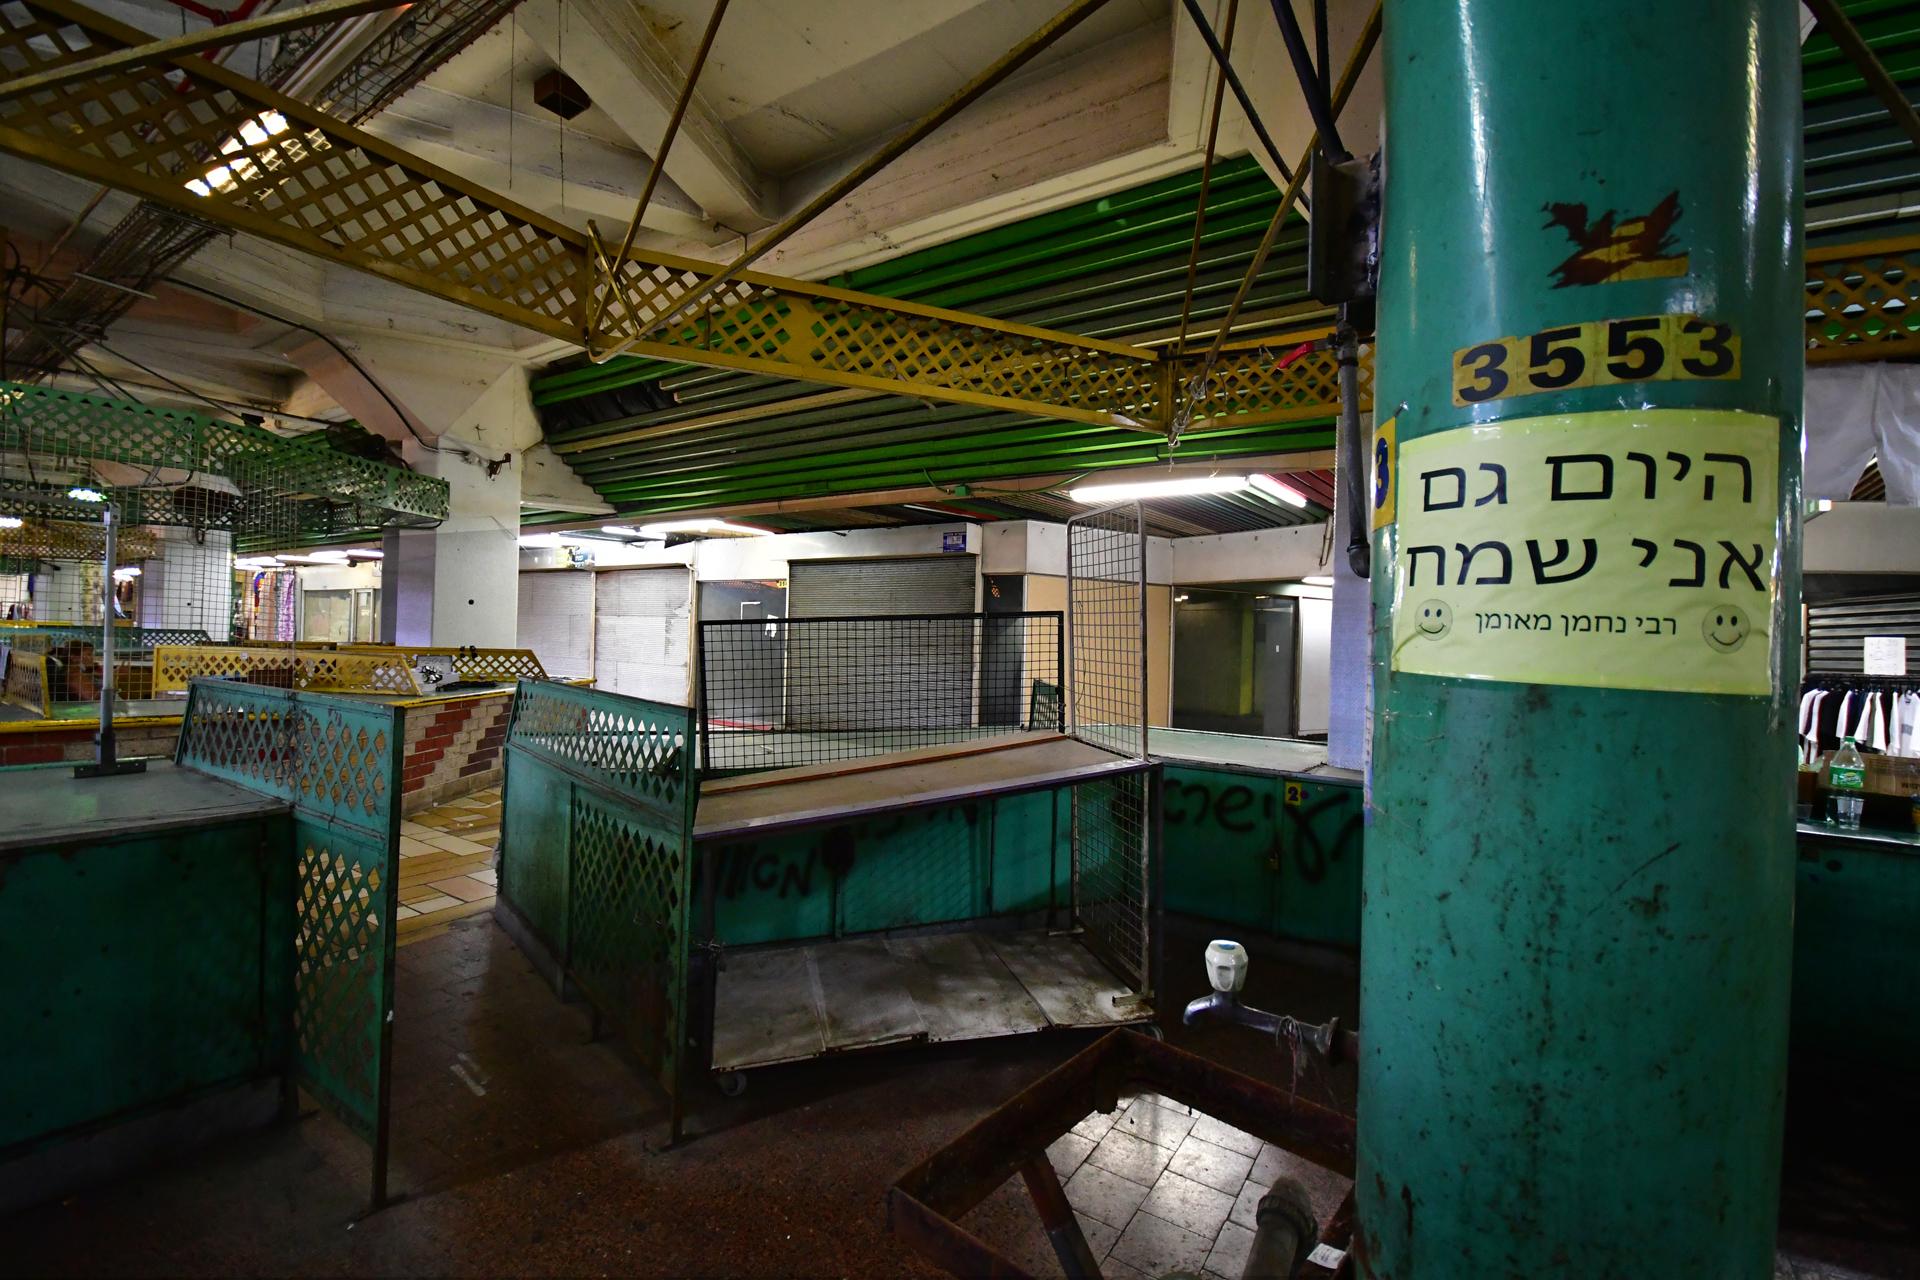 New central station - yoel sitruk יואל שתרוג - אדמה יוצרת - 2021 - תחנה מרכזית חדשה תל אביב